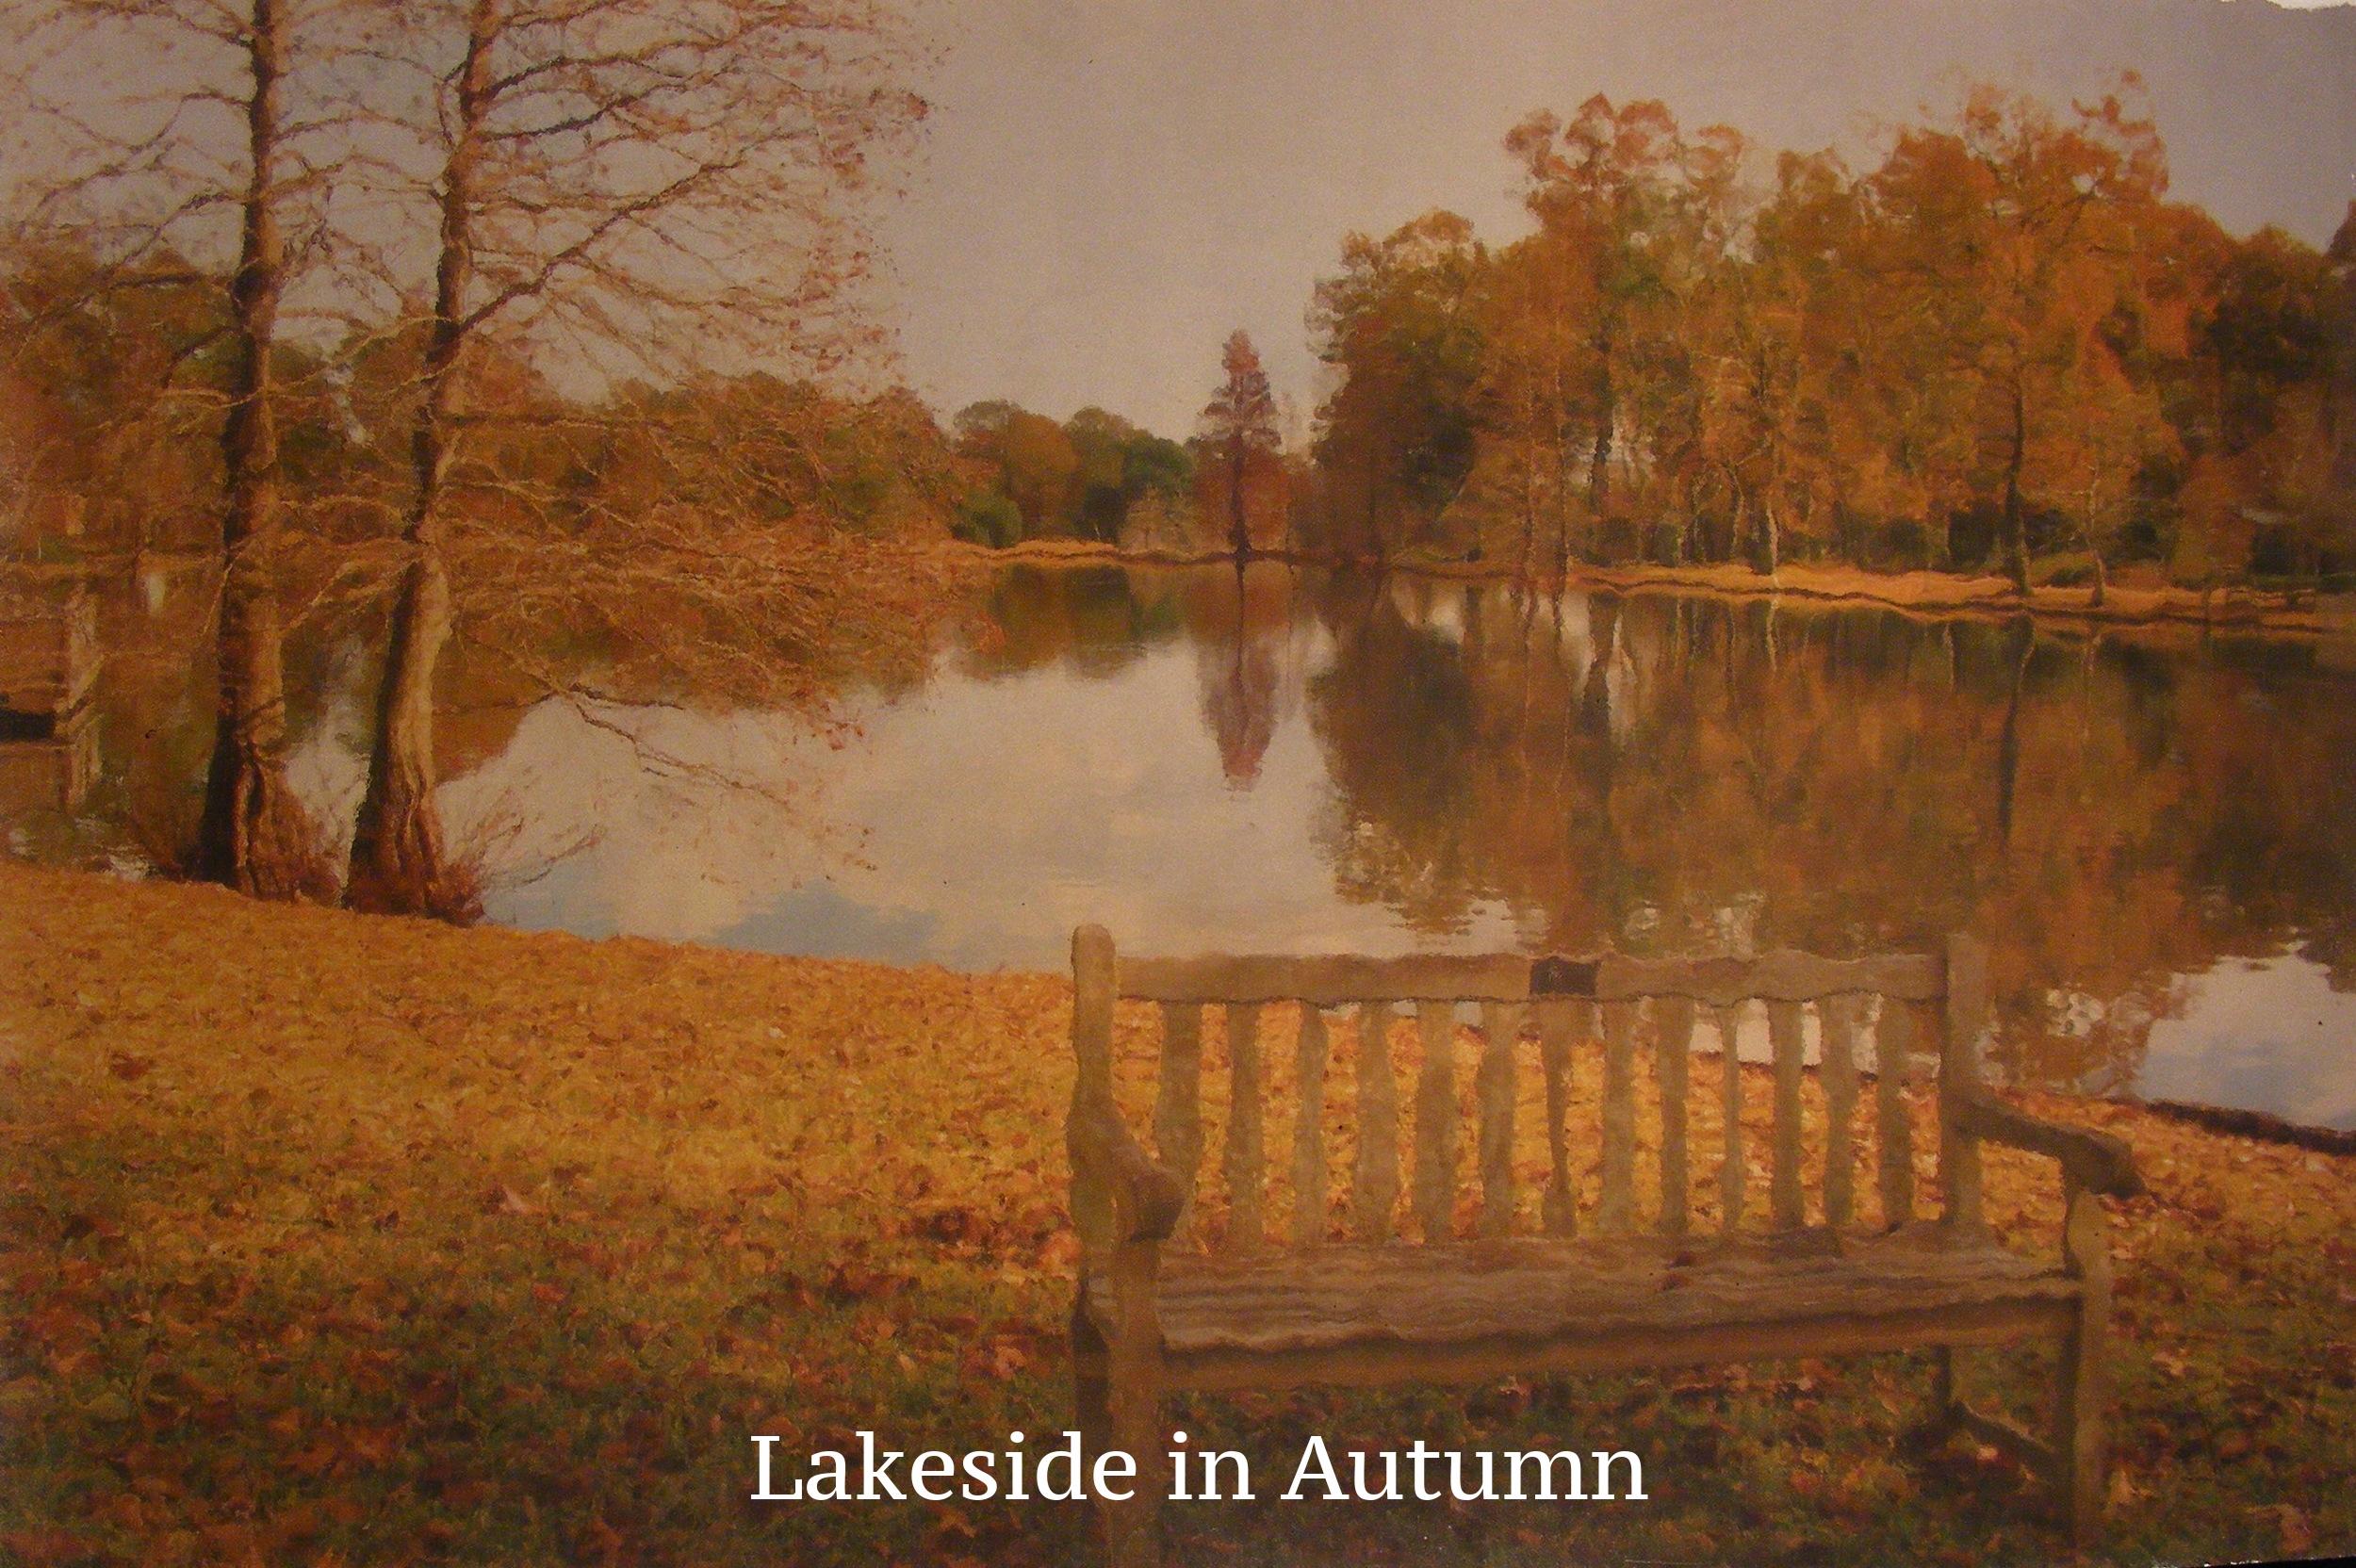 Lakeside in Autumn